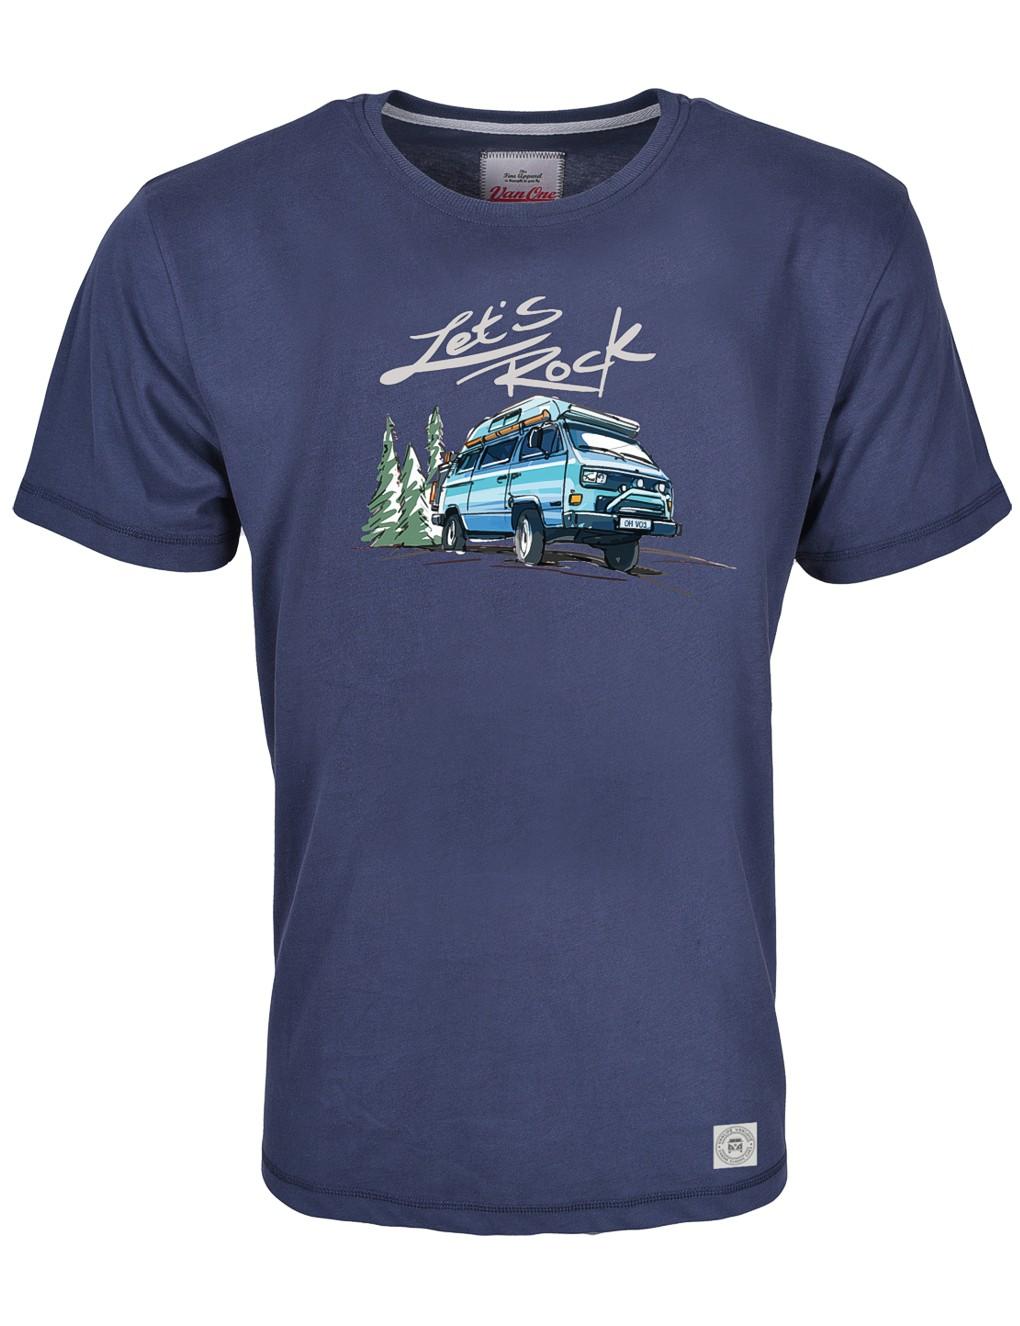 Herren T-Shirt VW Bulli »LETS ROCK« Blau